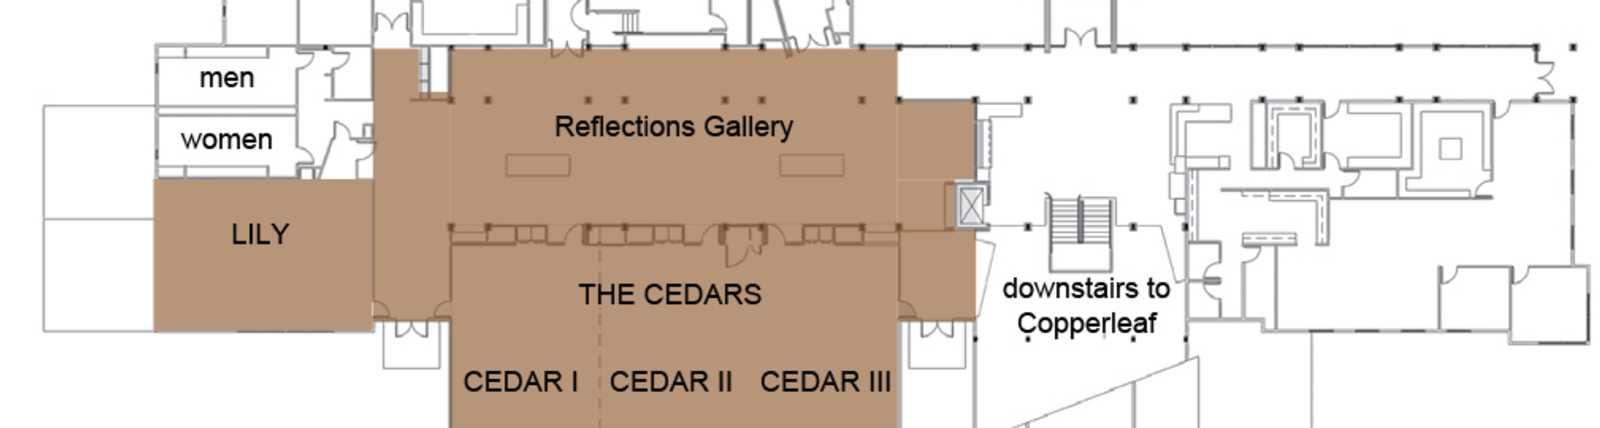 meeting-facility-Cedarbrook_Lodge_Meeting_Facility-7.jpg